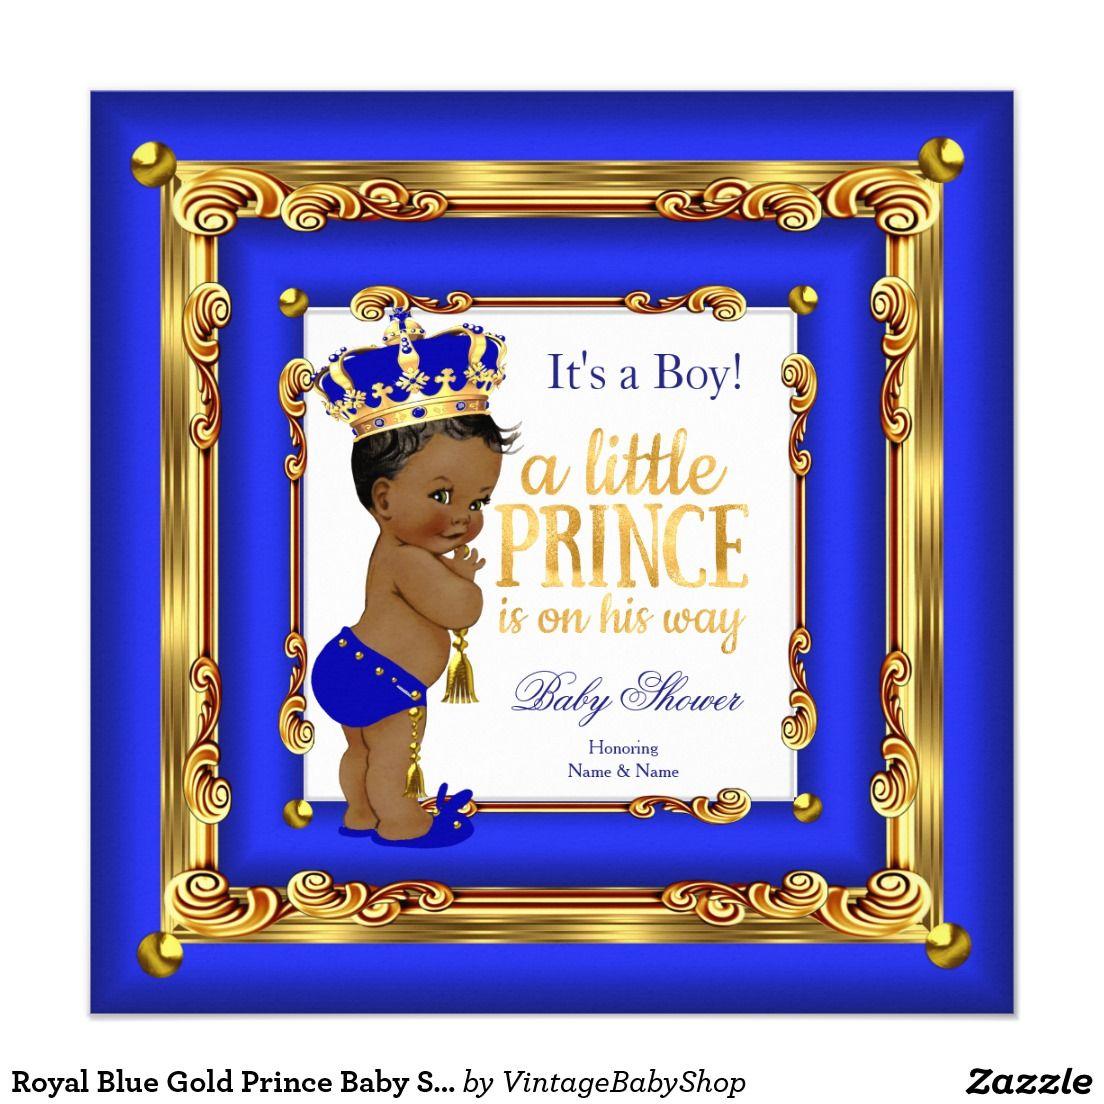 royal blue gold prince baby shower ethnic boy card